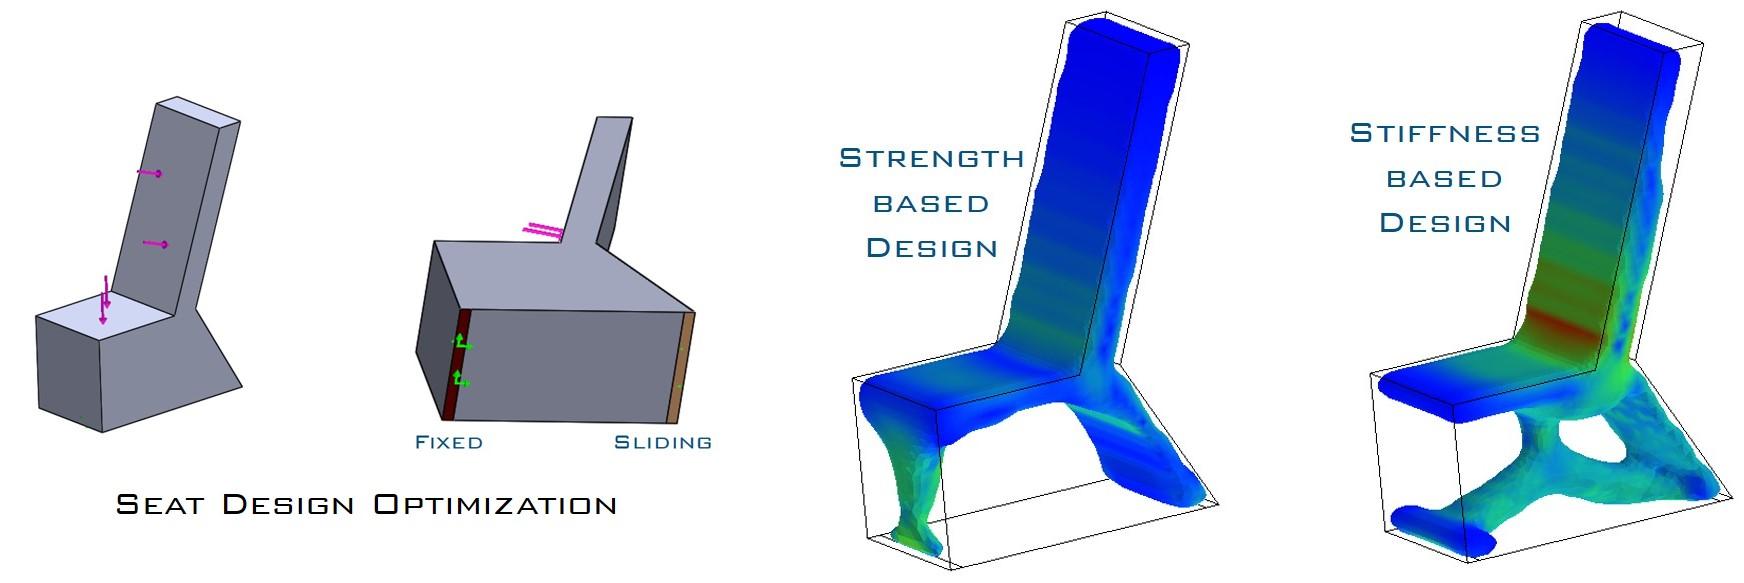 Seat_Design.jpg